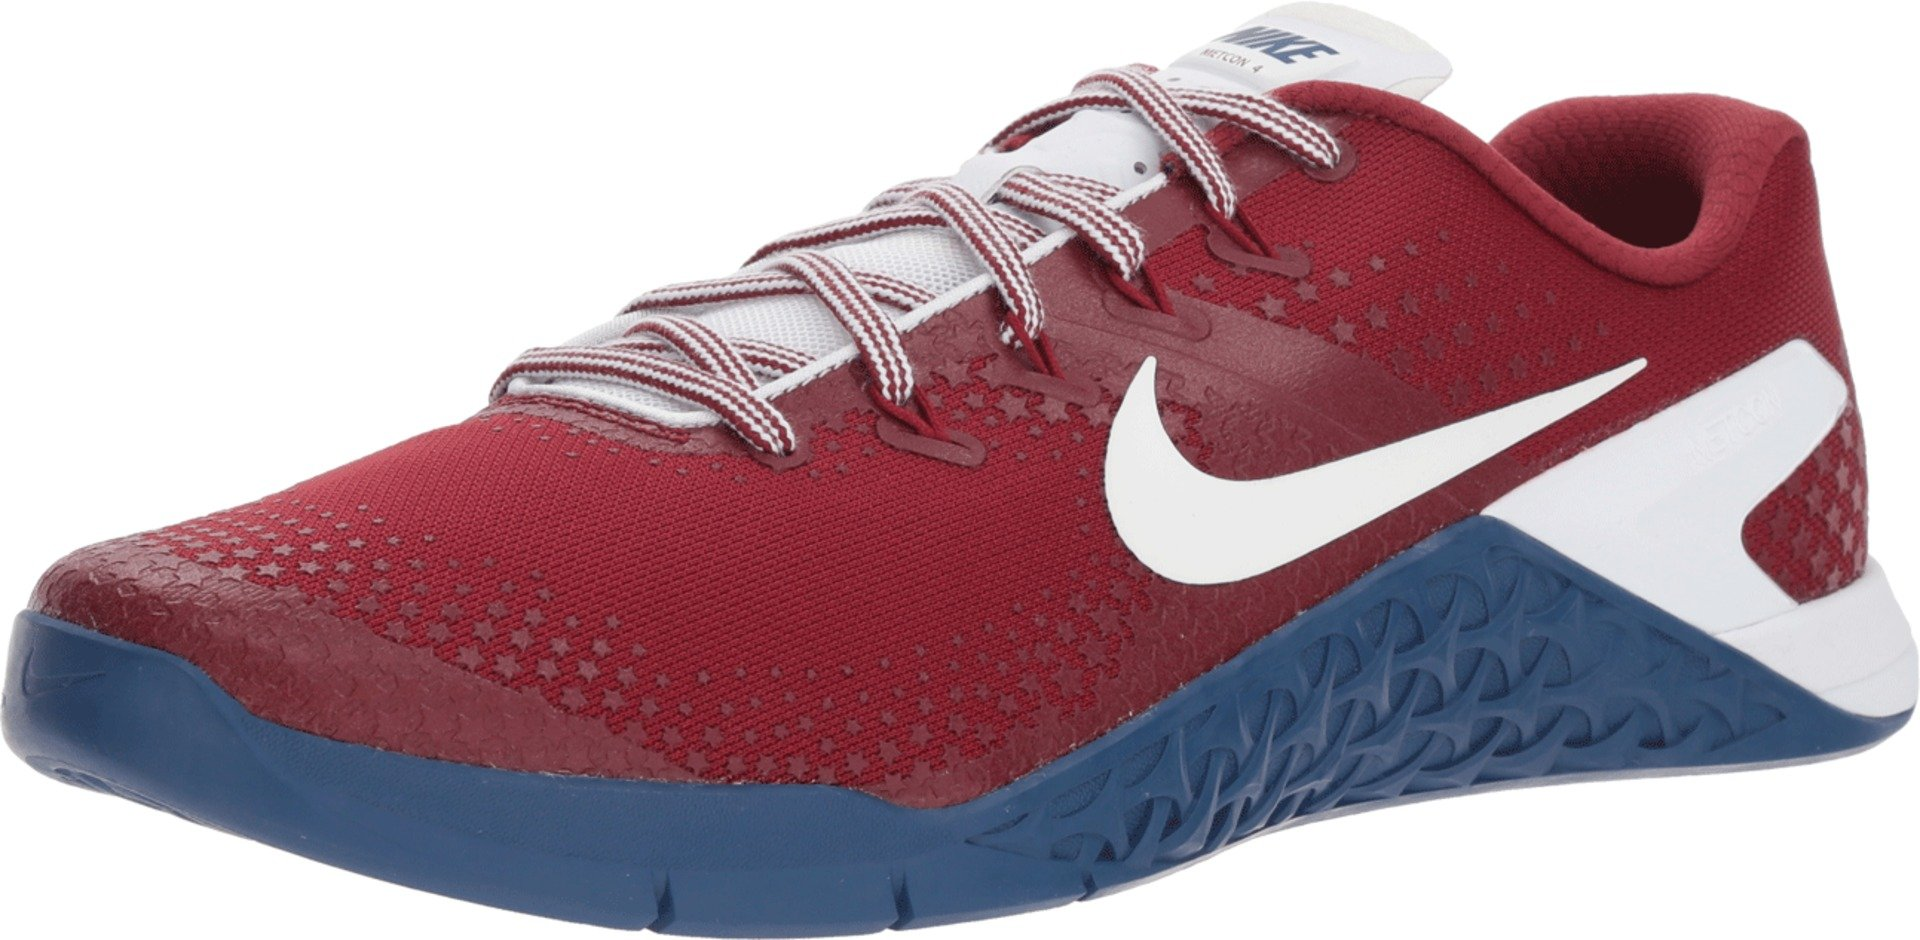 Nike Men's Metcon 4 Americana Training Shoe Team RED/White-Gym Blue 7.0